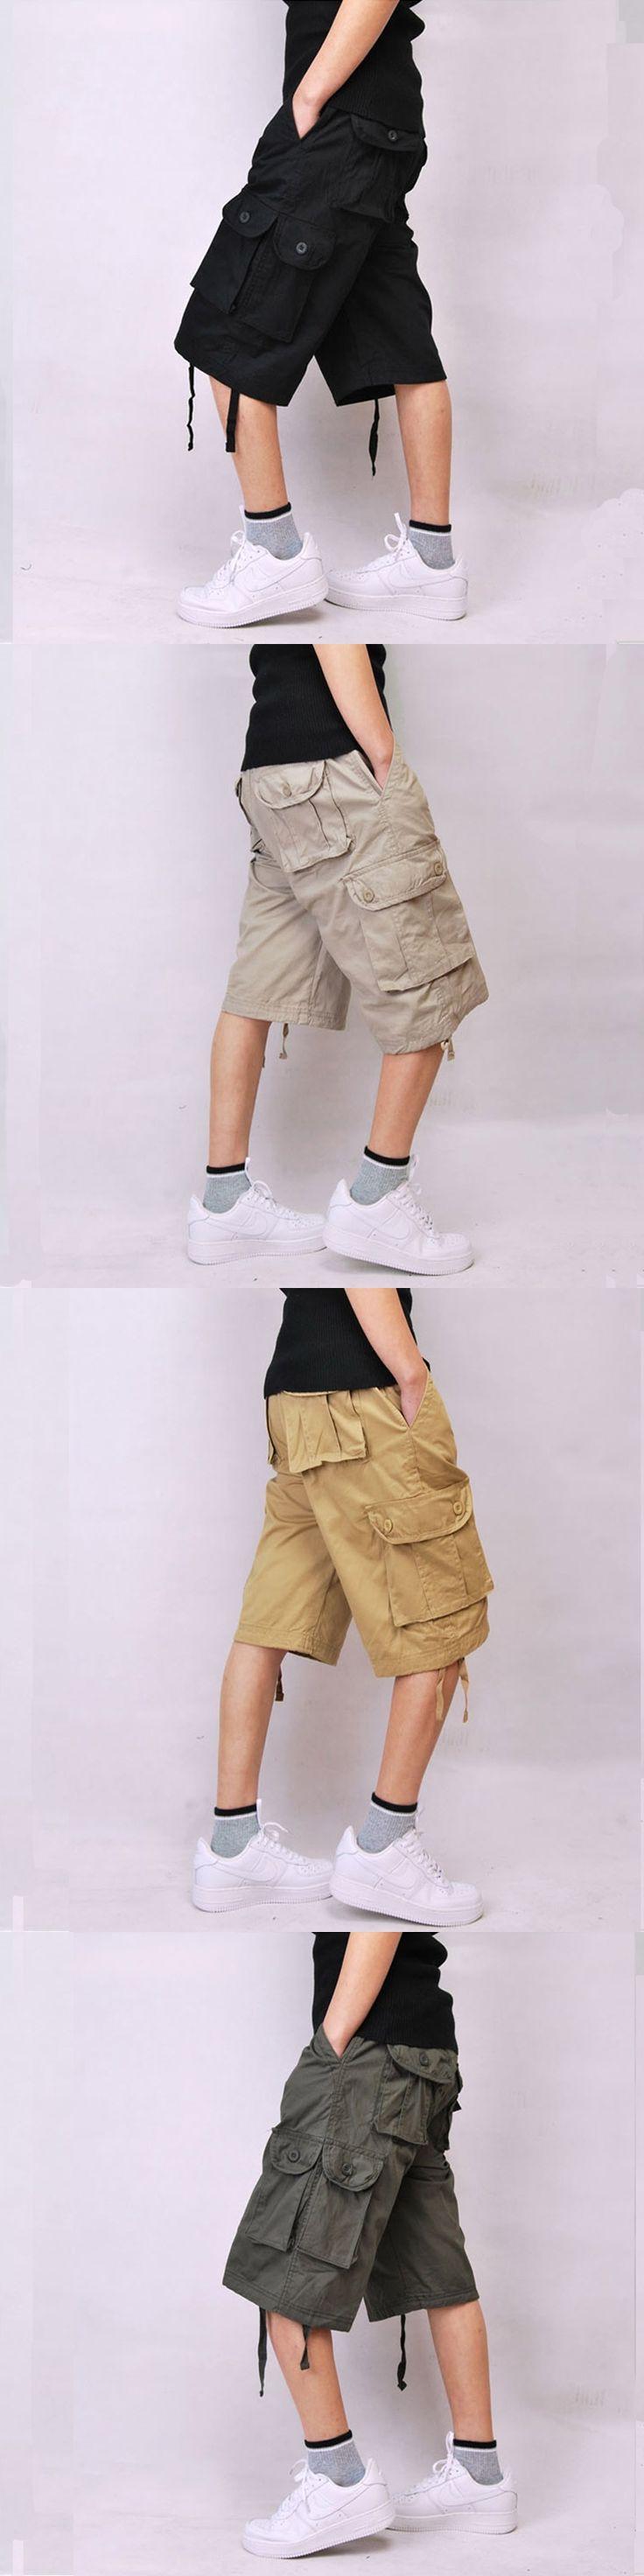 Baggy Beige Multi-pocket Khaki Green Men's Cargo Shorts Black Cotton Hip pop Plus Size 30-44 Army Military Combat